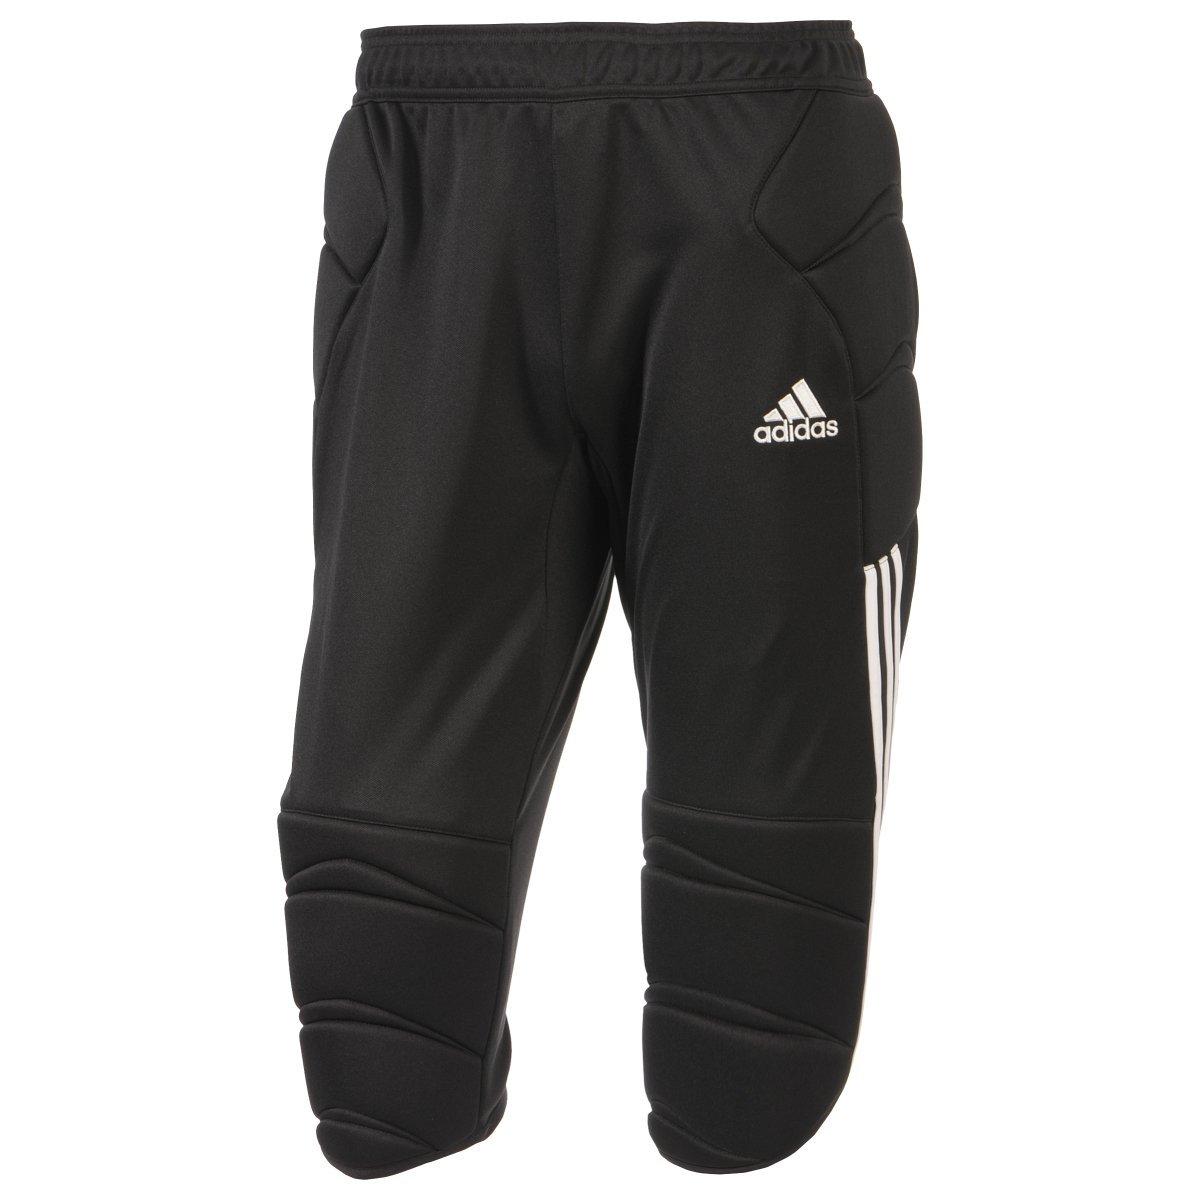 Kalhoty 3/4 adidas TIERRO13 GK 34